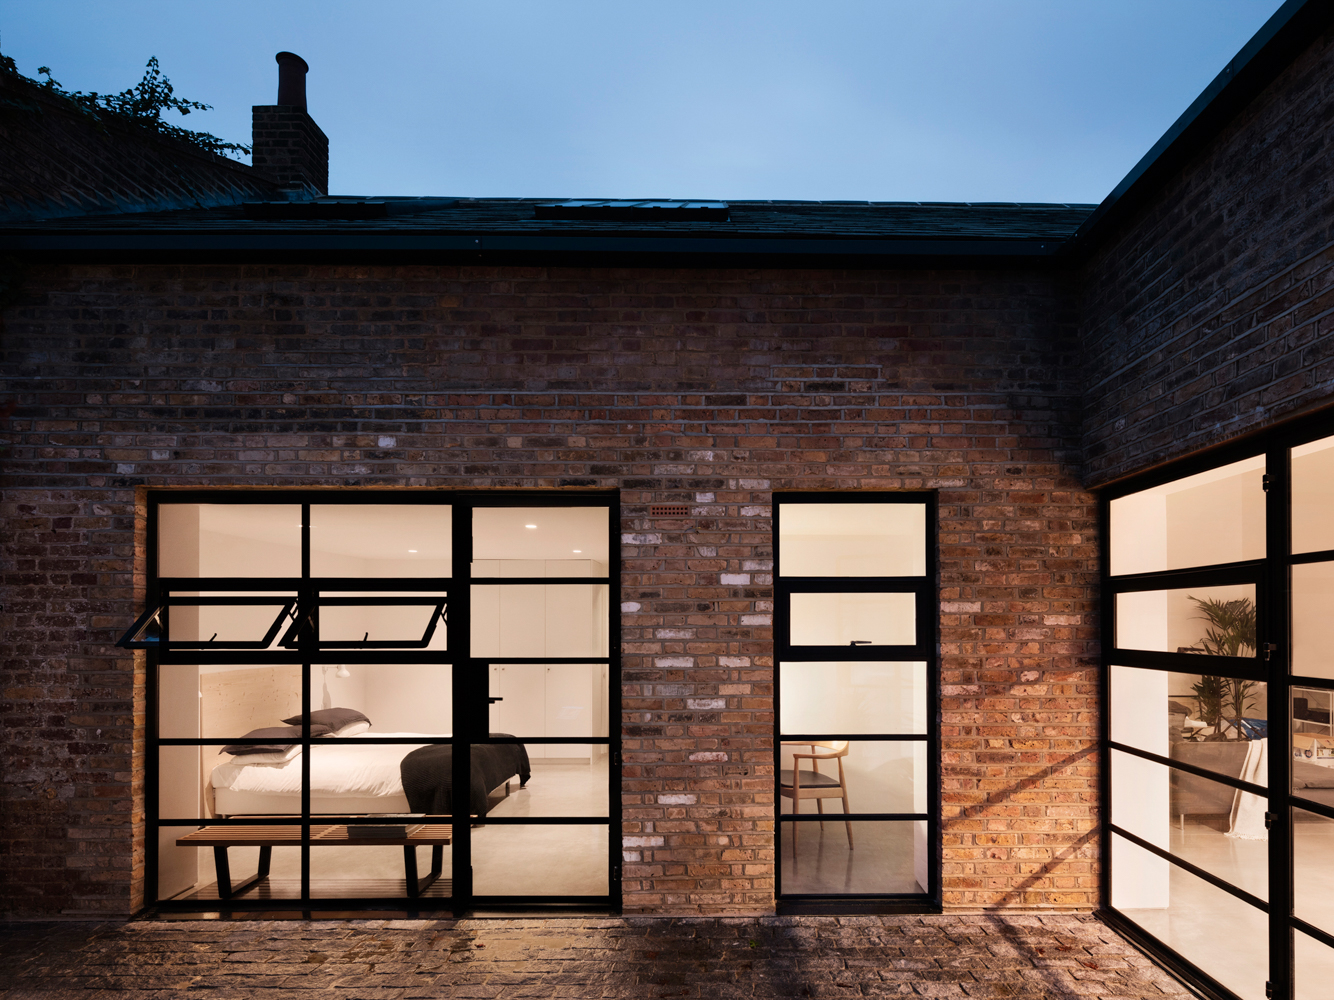 defoe-road-paper-house-project-the-design-emotive-15.jpg